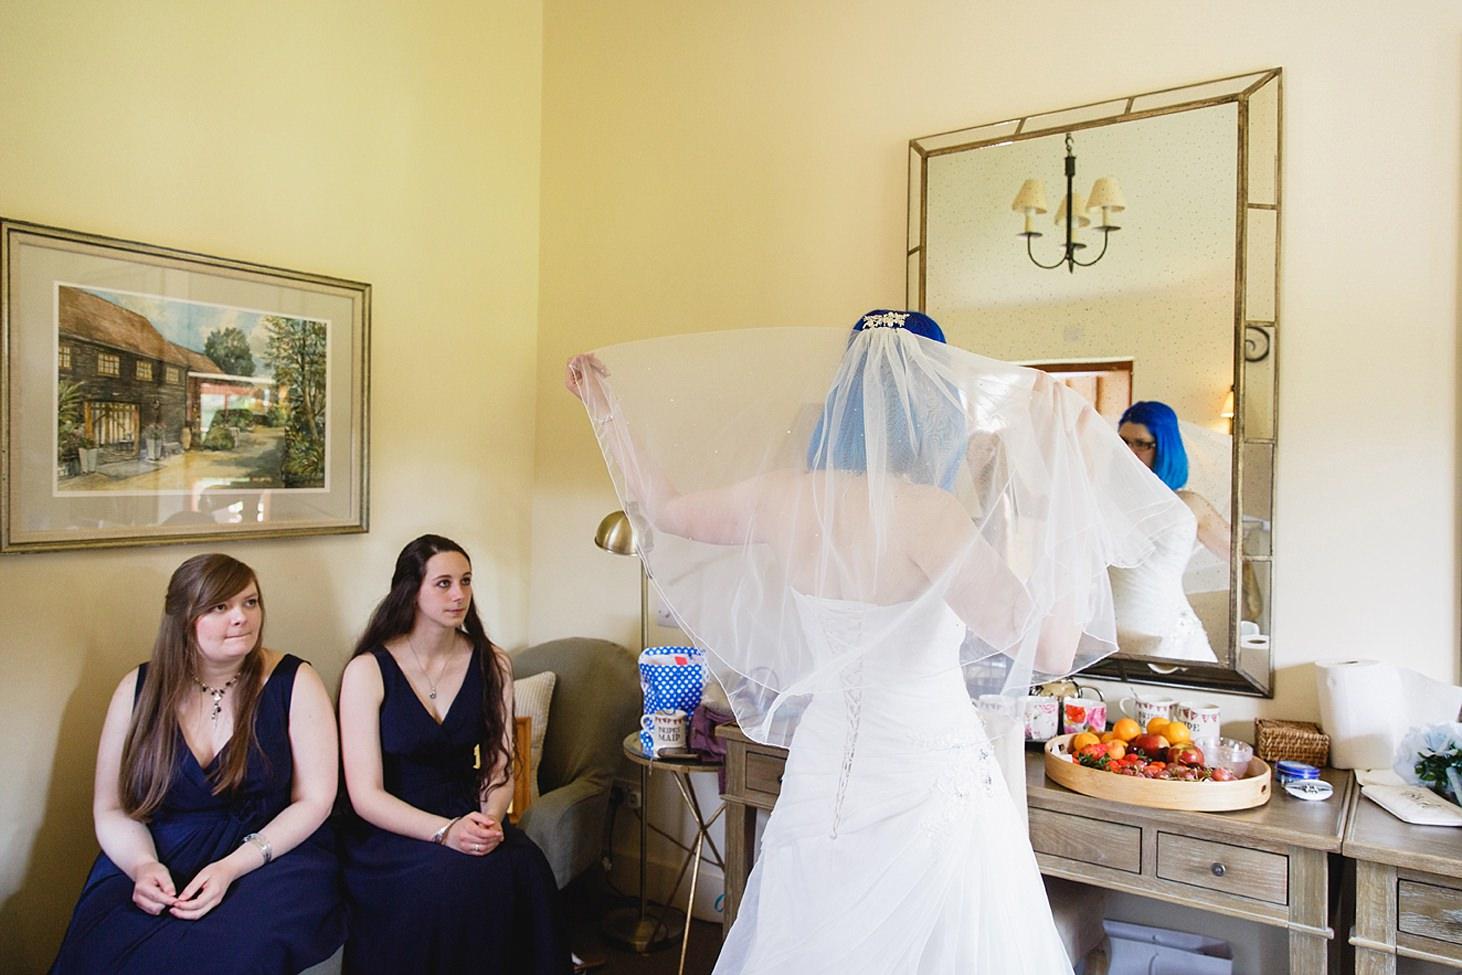 gate street barn wedding photography bride putting on veil